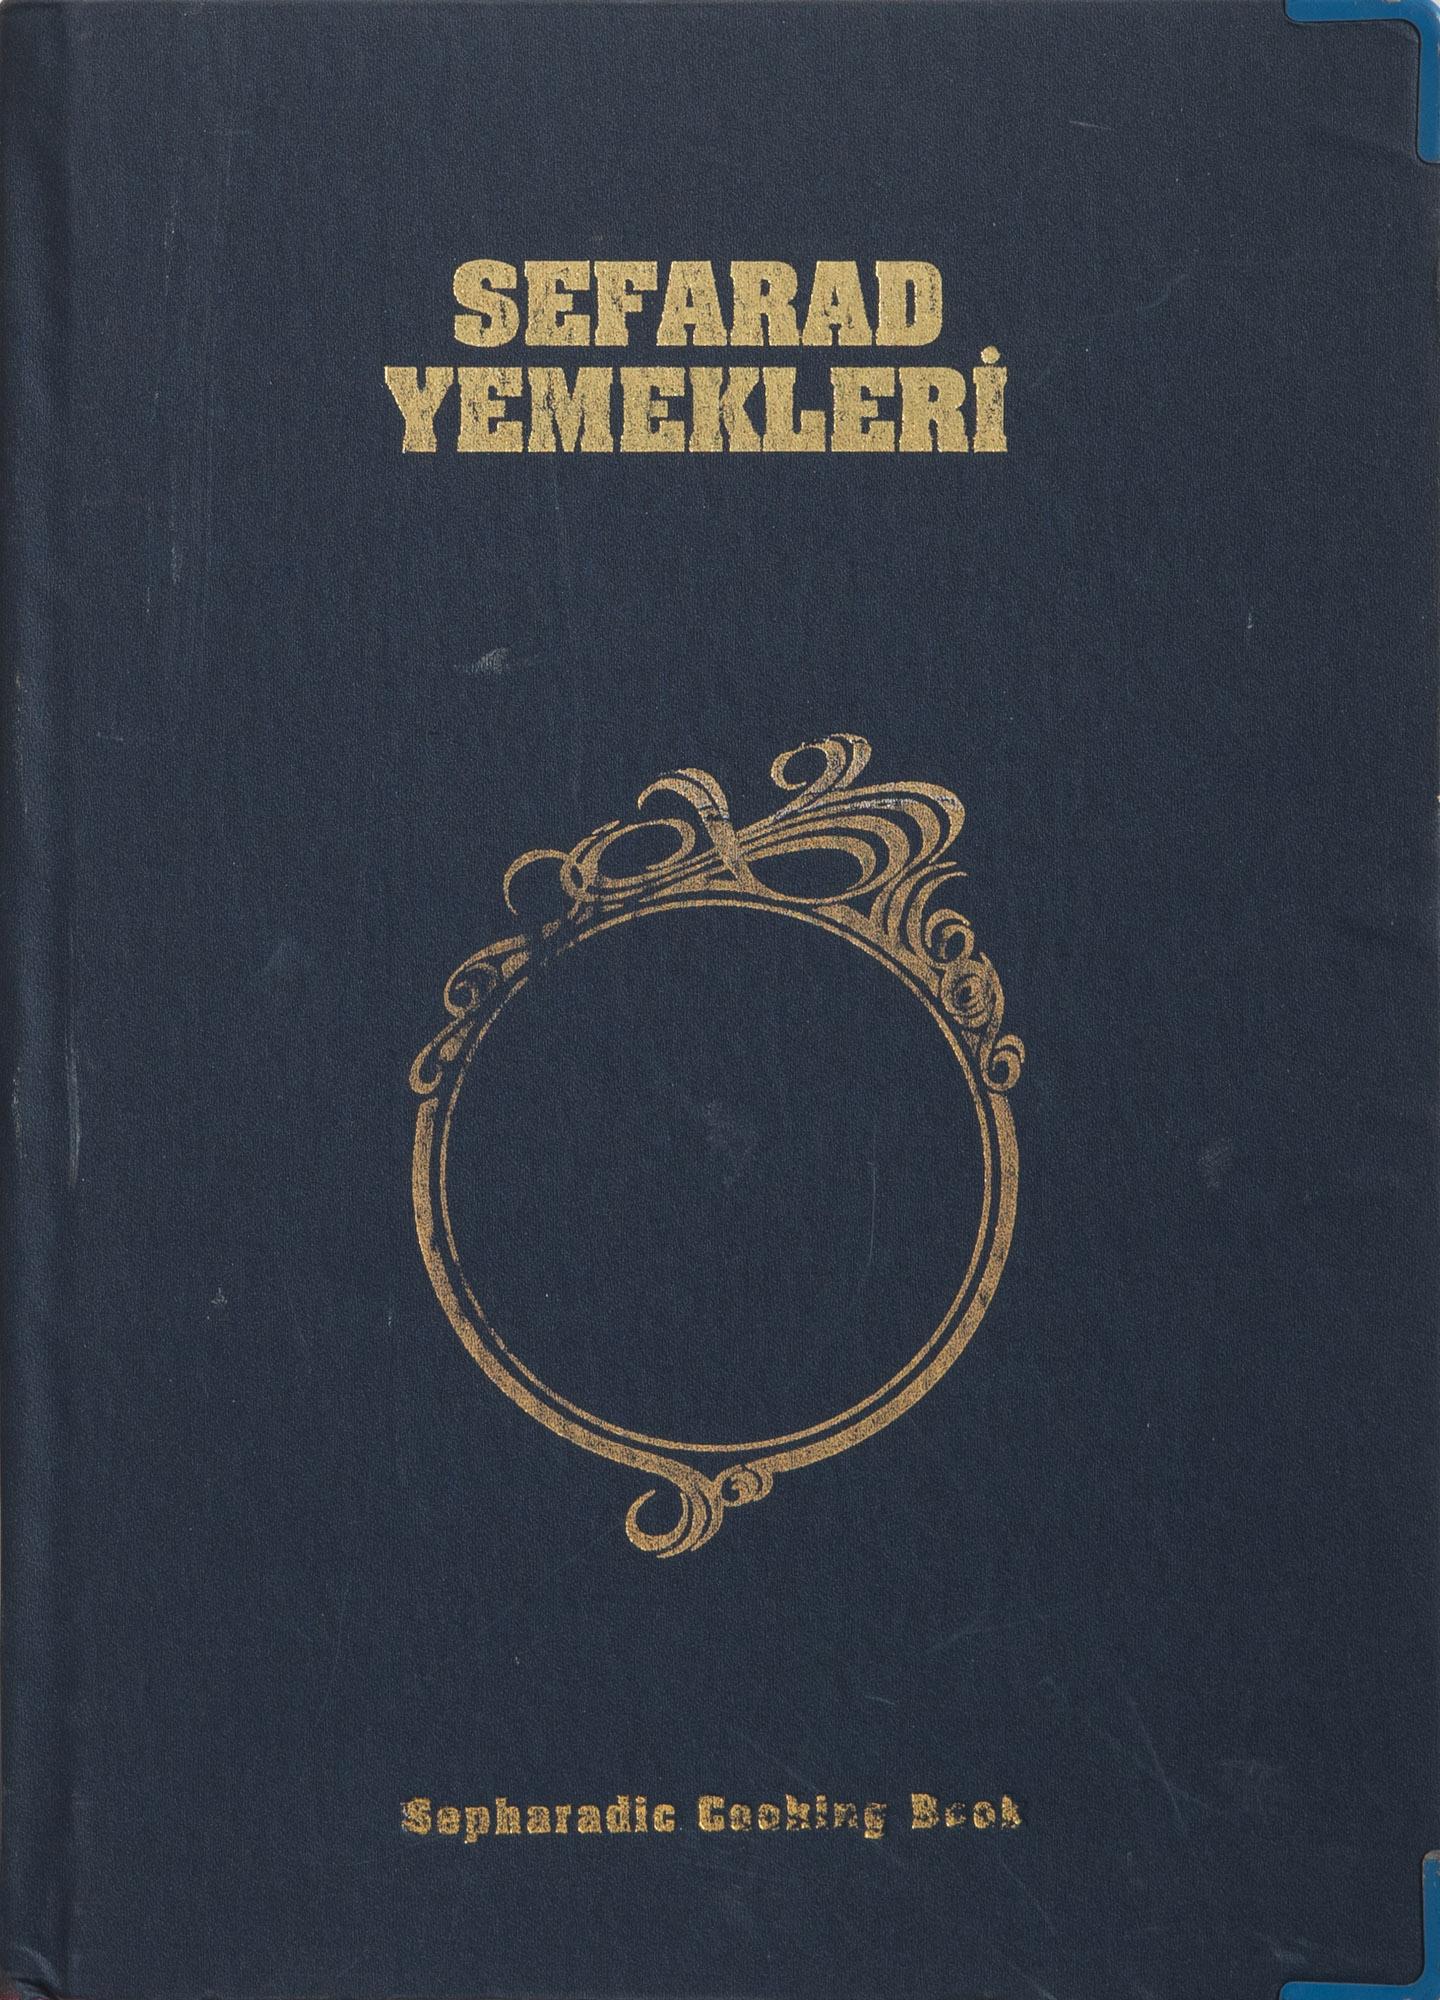 The cover of the cookbook Sefarad Yerekleri